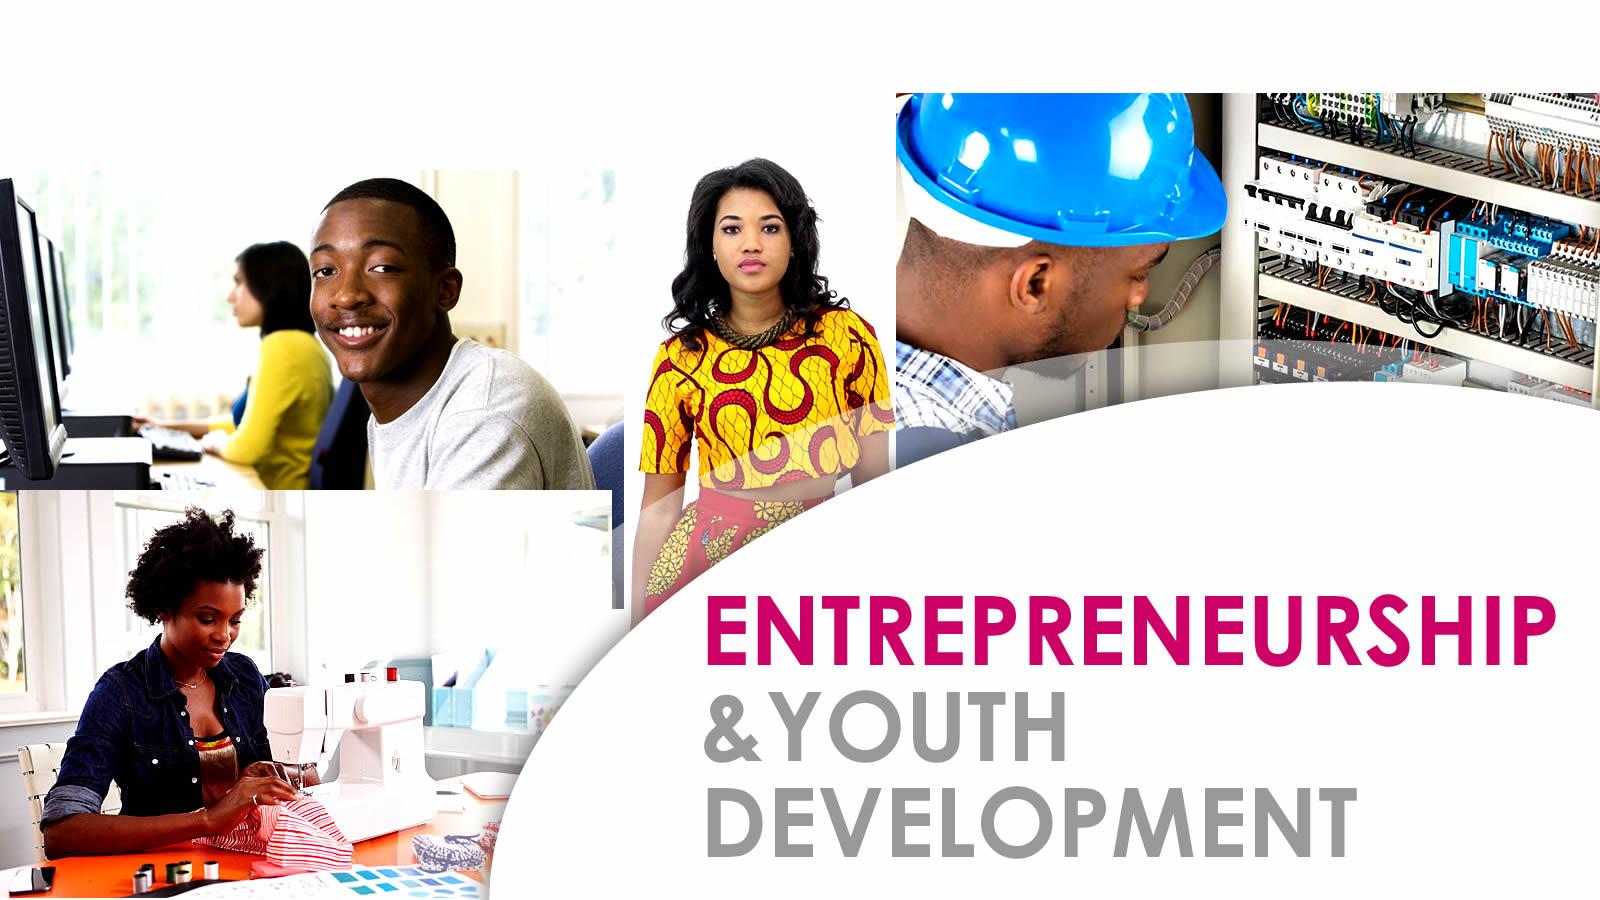 Entrepreneurship and youth development